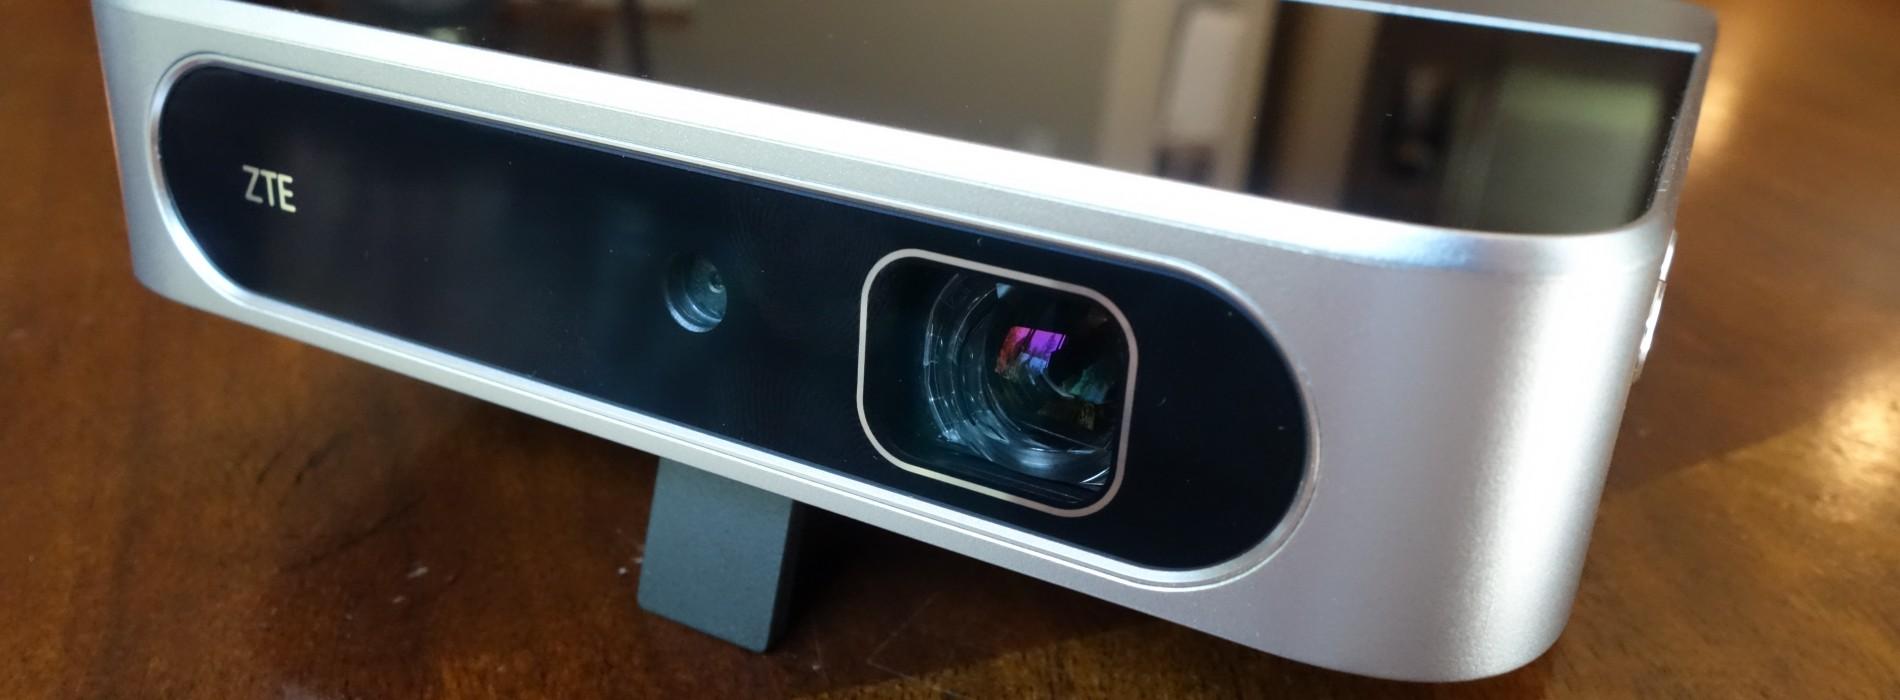 size the zte projector verizon them Redding